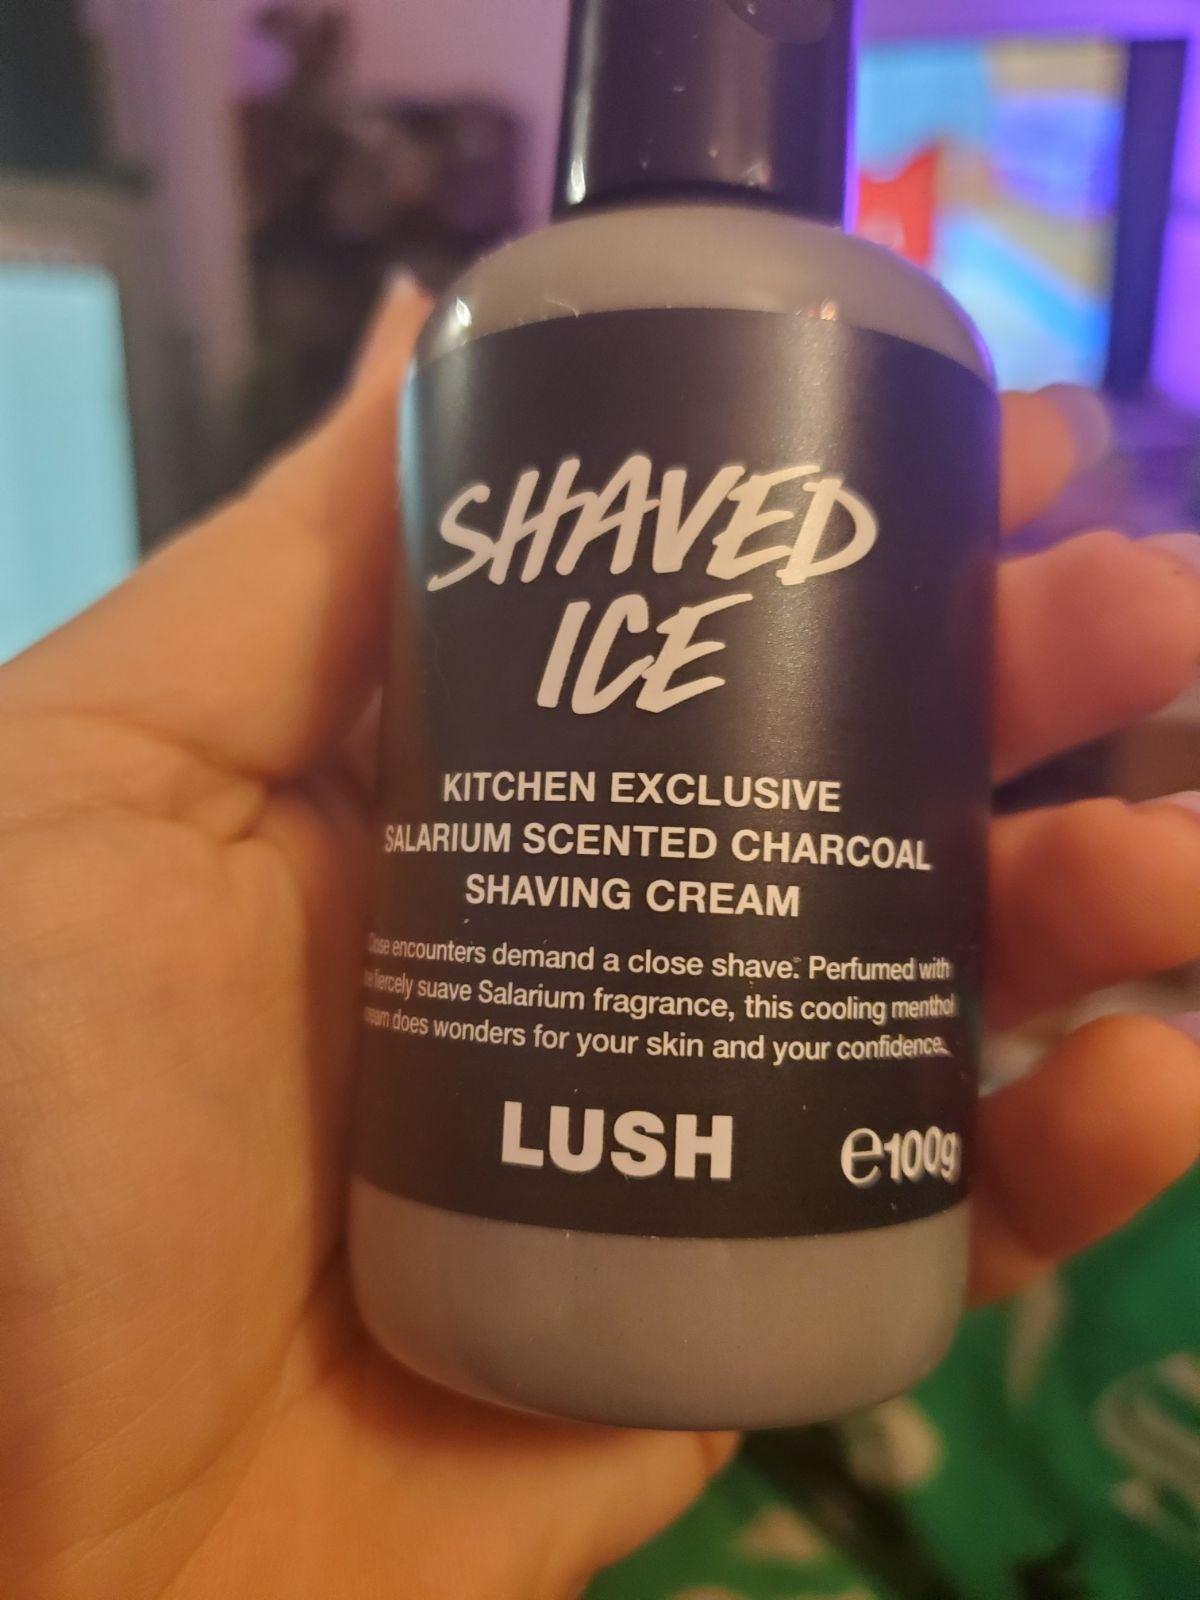 Lush Shaved Ice Shaving Cream